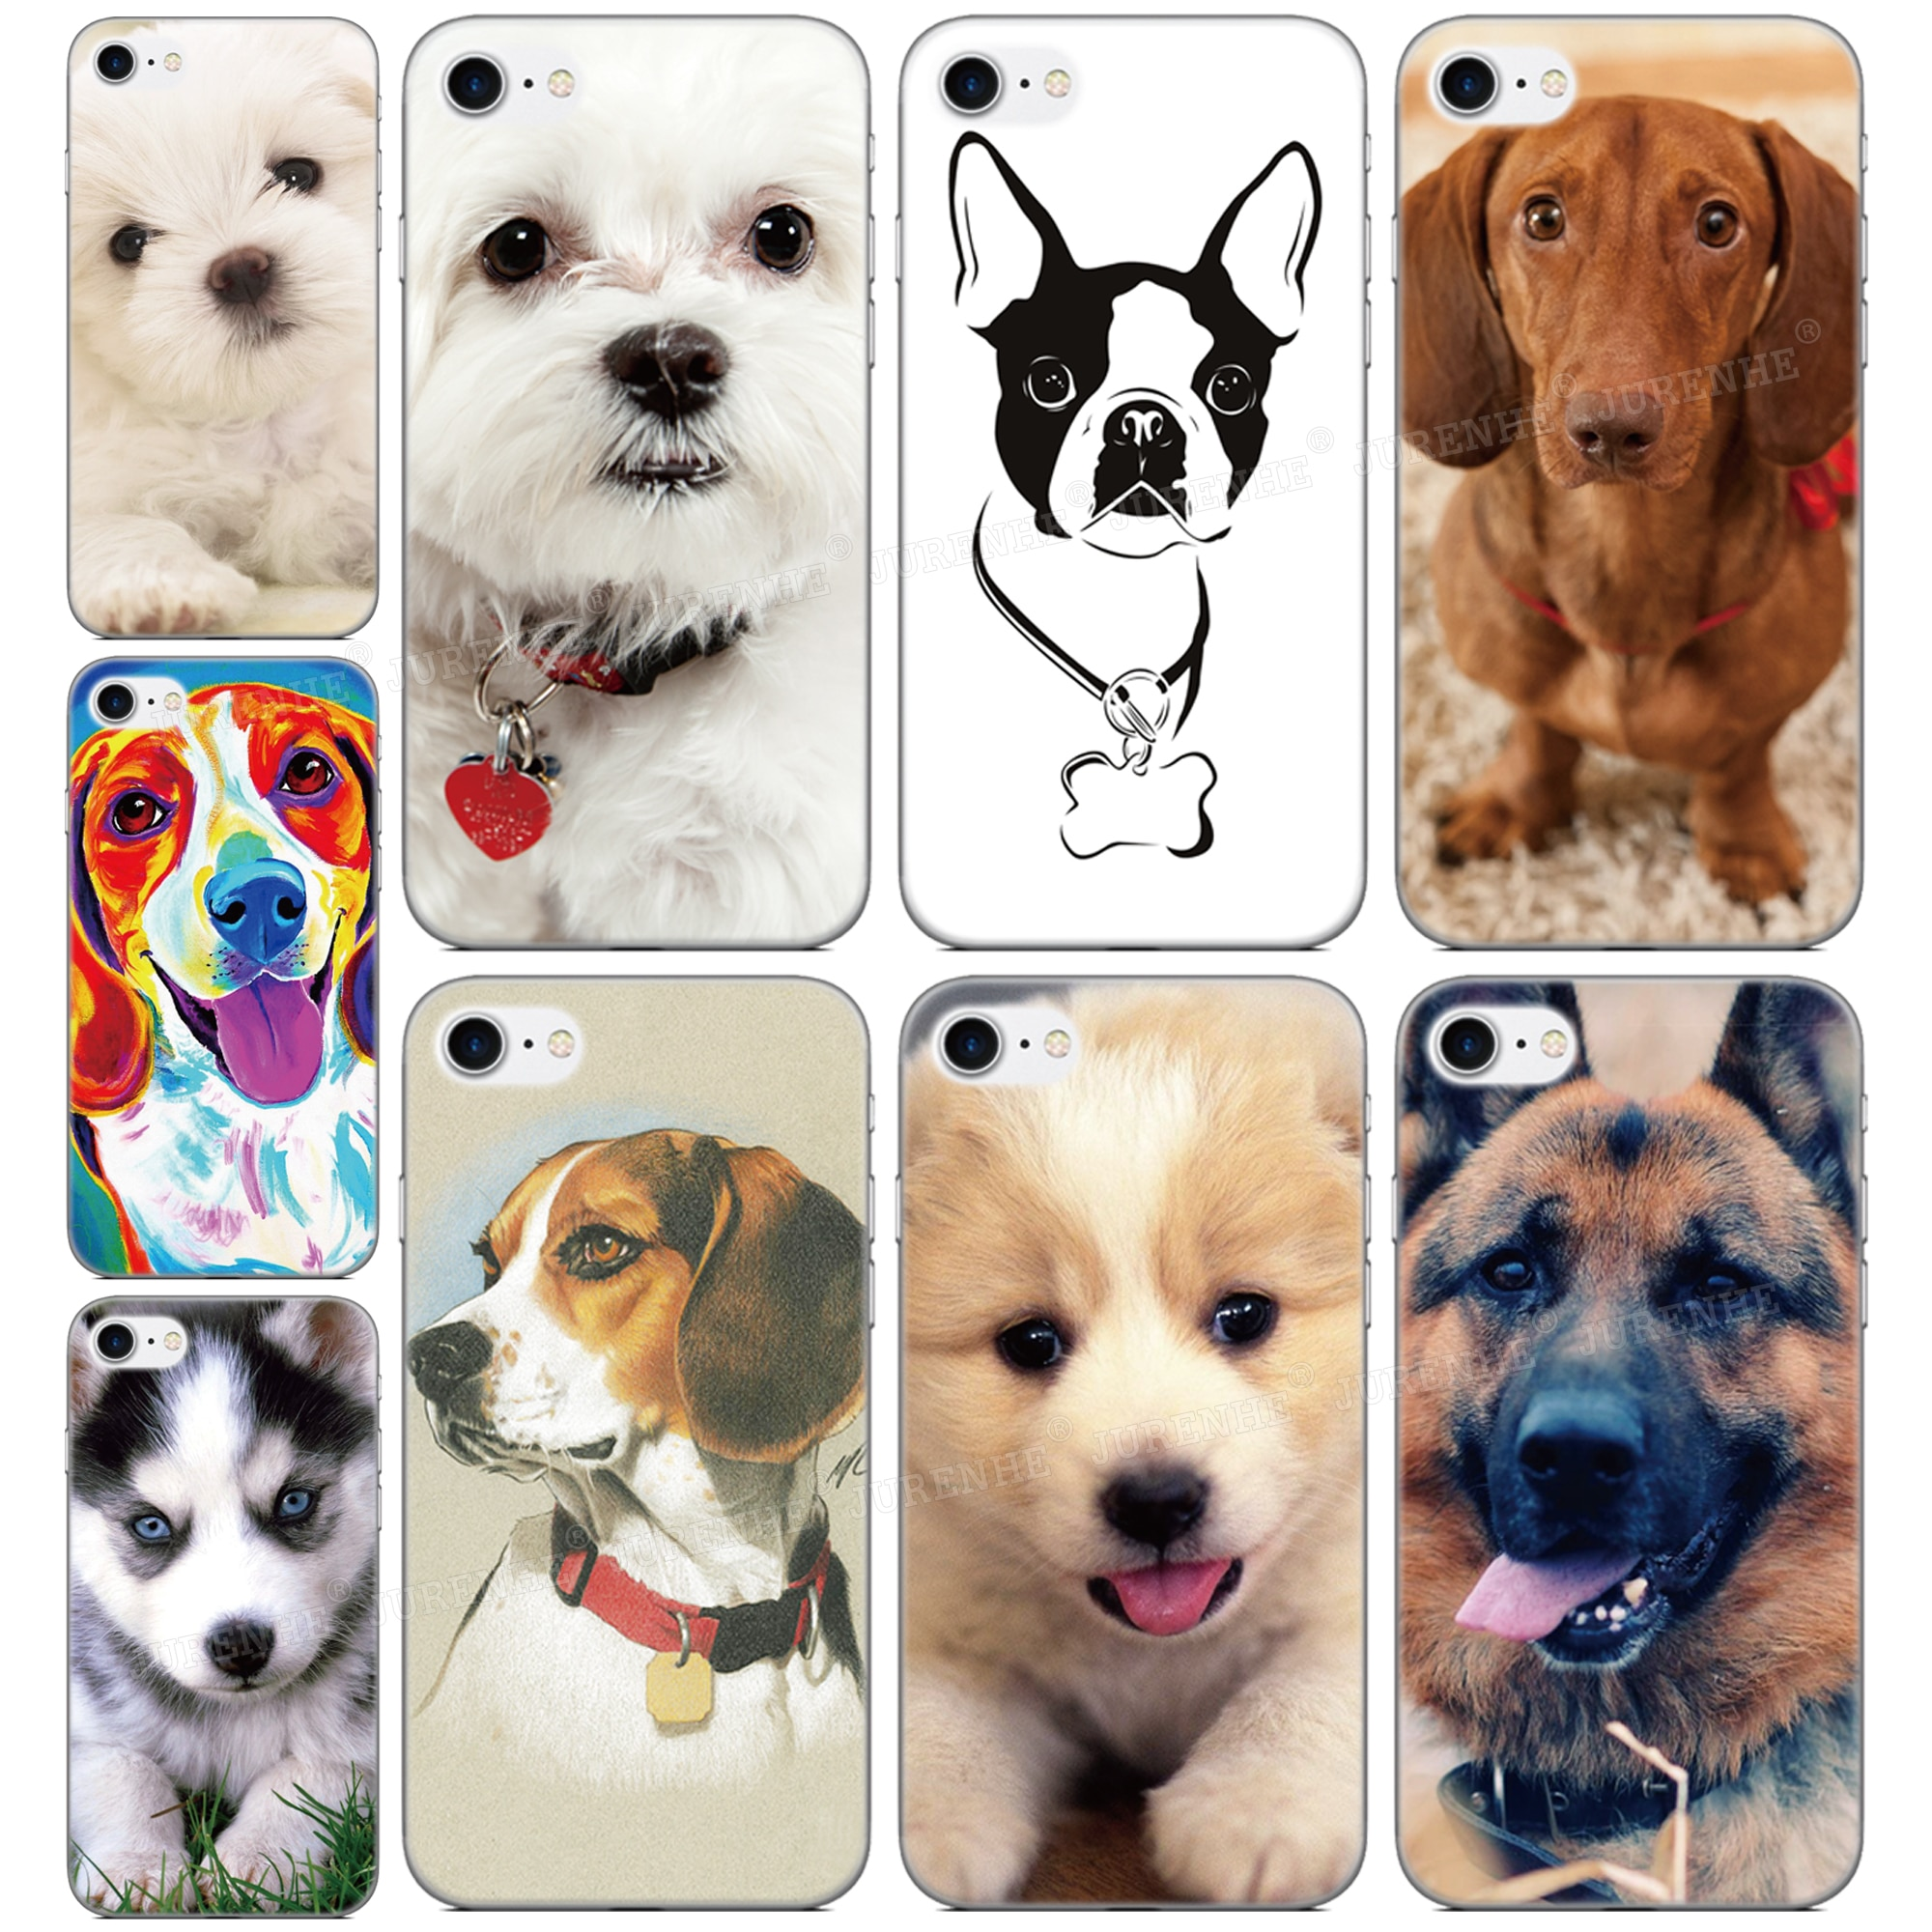 Funda de perro mascota impresa para LG Q70 K61 K51s K50s K40s Q60 K50 K40 K30 K20 2019 Stylo 5 4 G7 G8 G8X G8S V50 V60 V50s, funda de teléfono Delgado